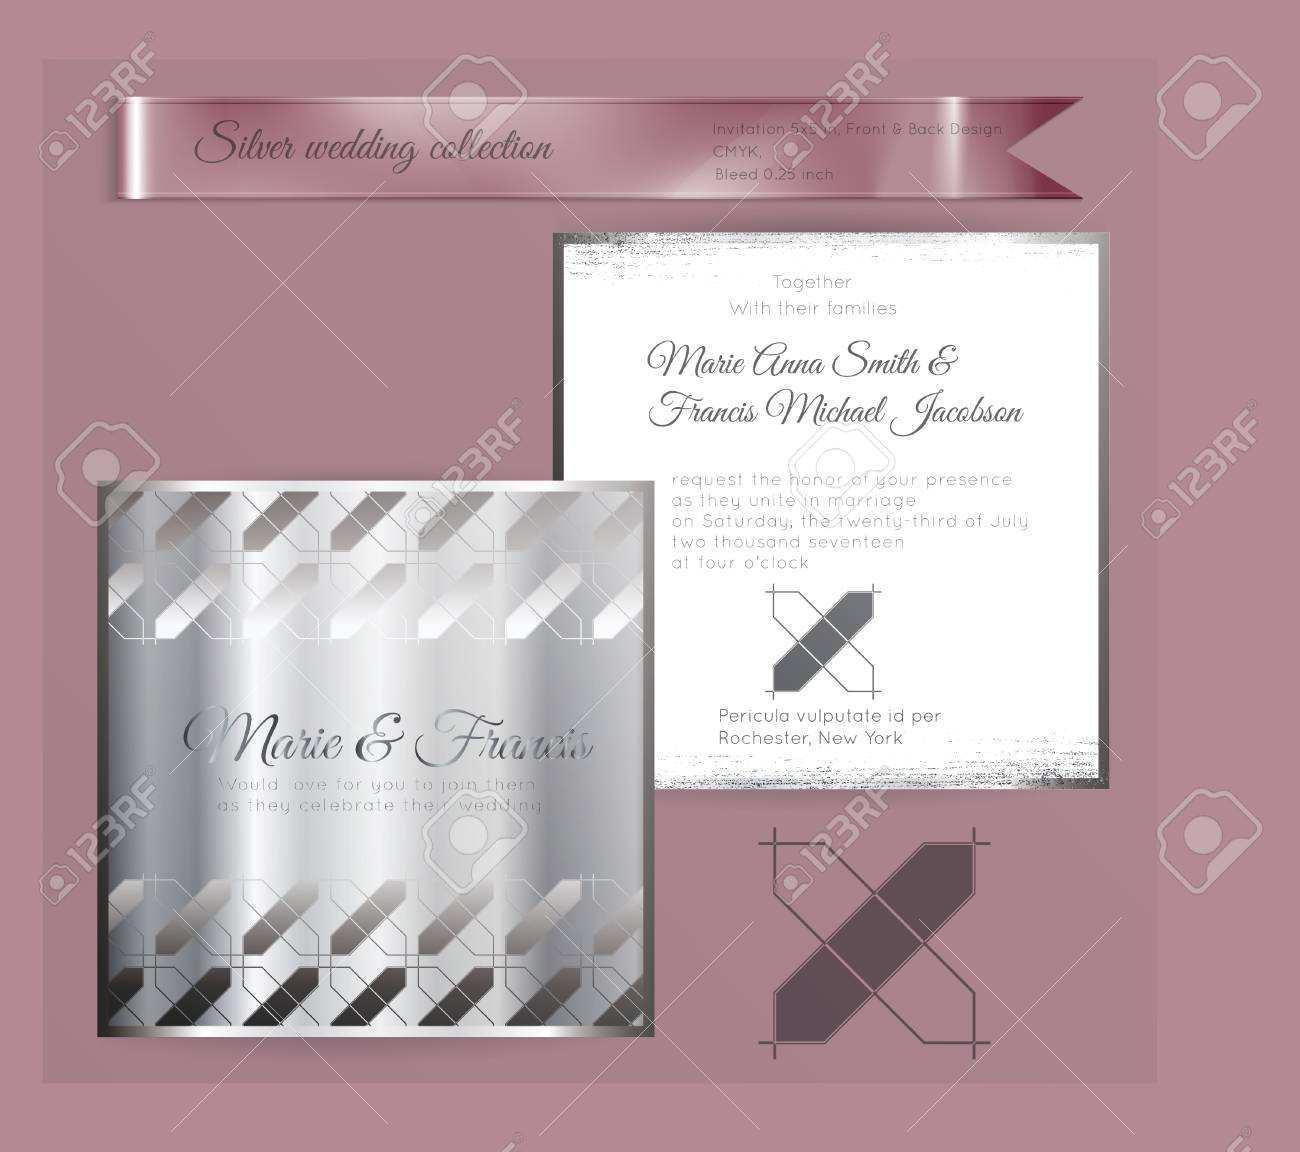 77 Free Printable Wedding Invitation Template Square Templates with Wedding Invitation Template Square